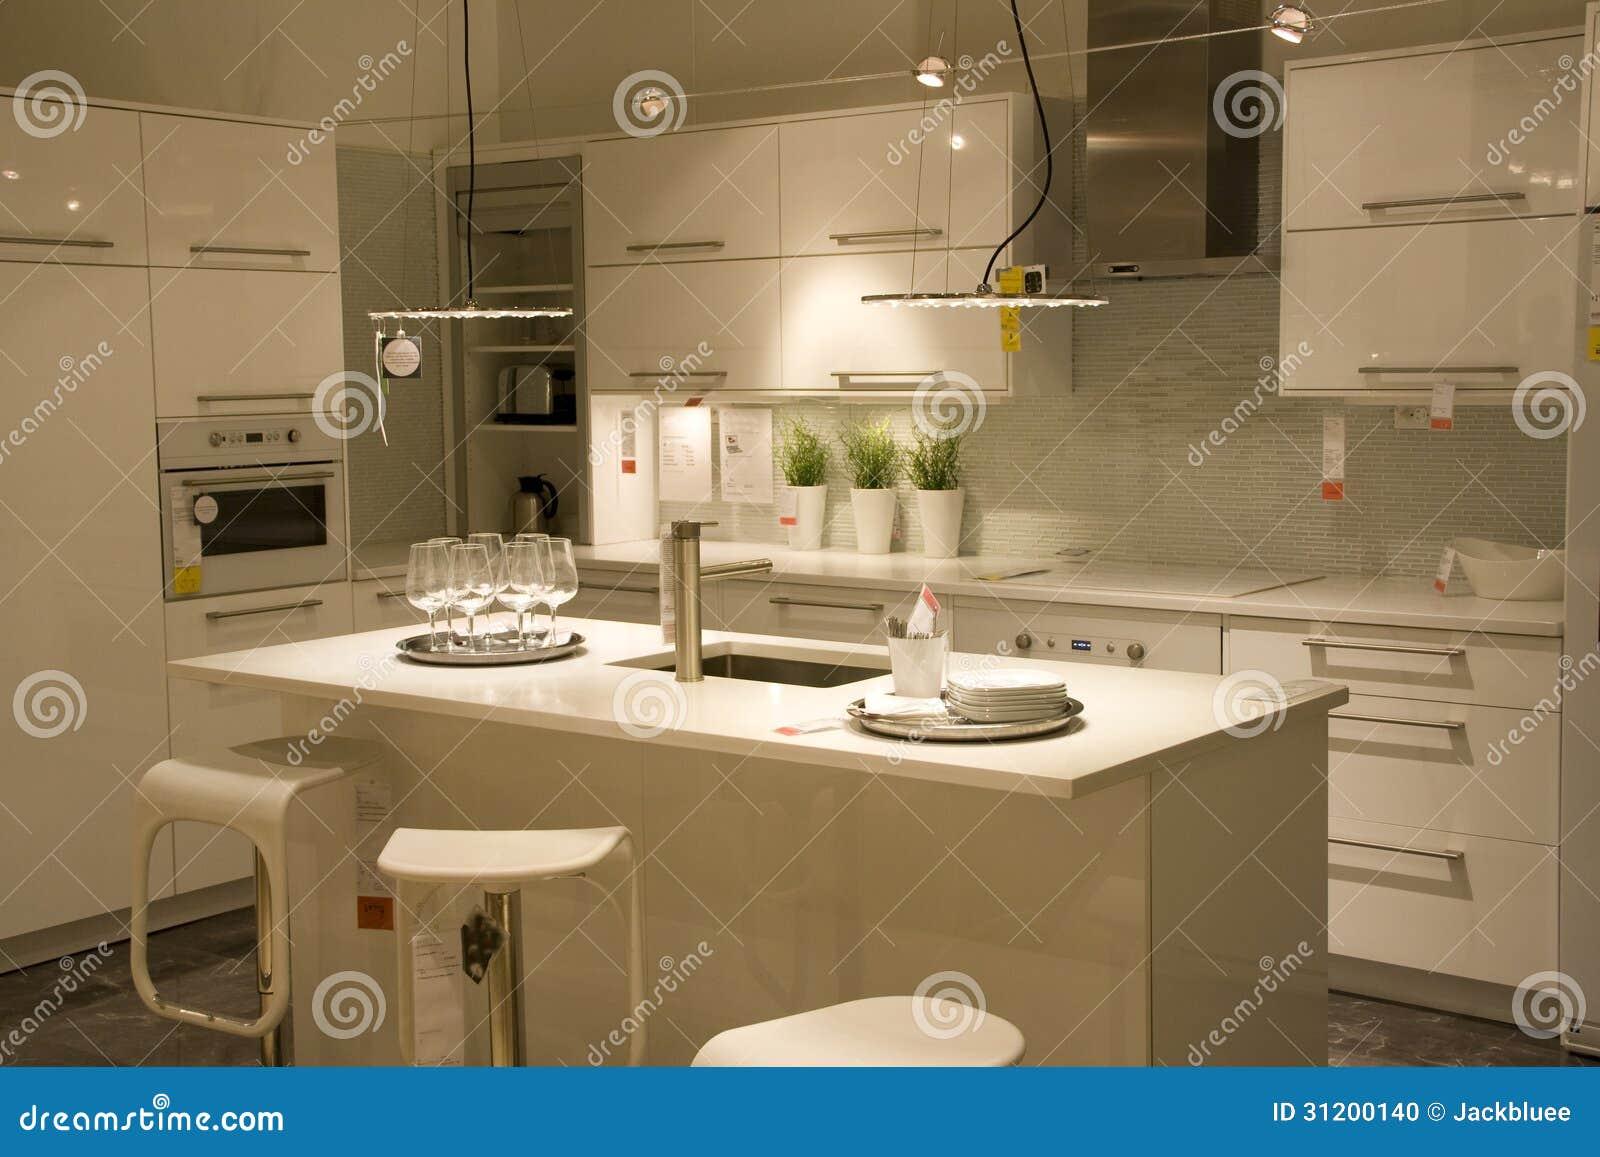 Cocina Diseno Moderno - Diseños Arquitectónicos - Mimasku.com